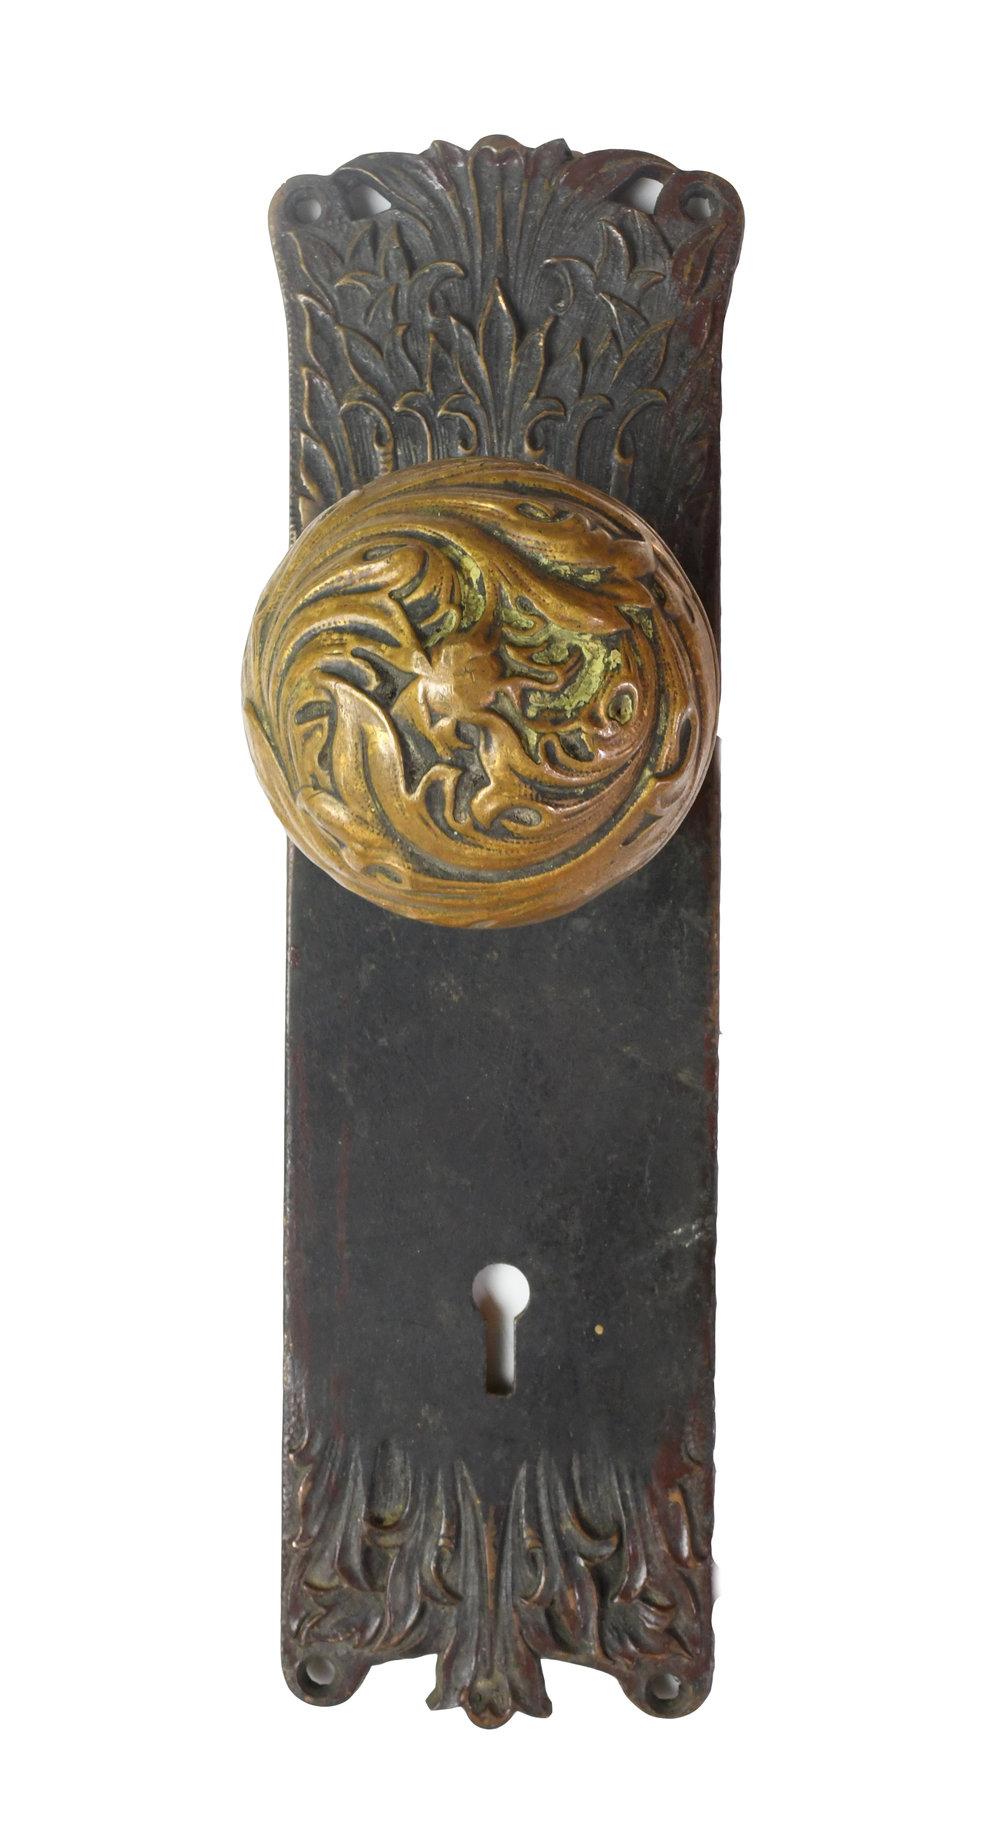 H20169-cast-brass-corbin-florence-door-knob-set-small-2.jpg